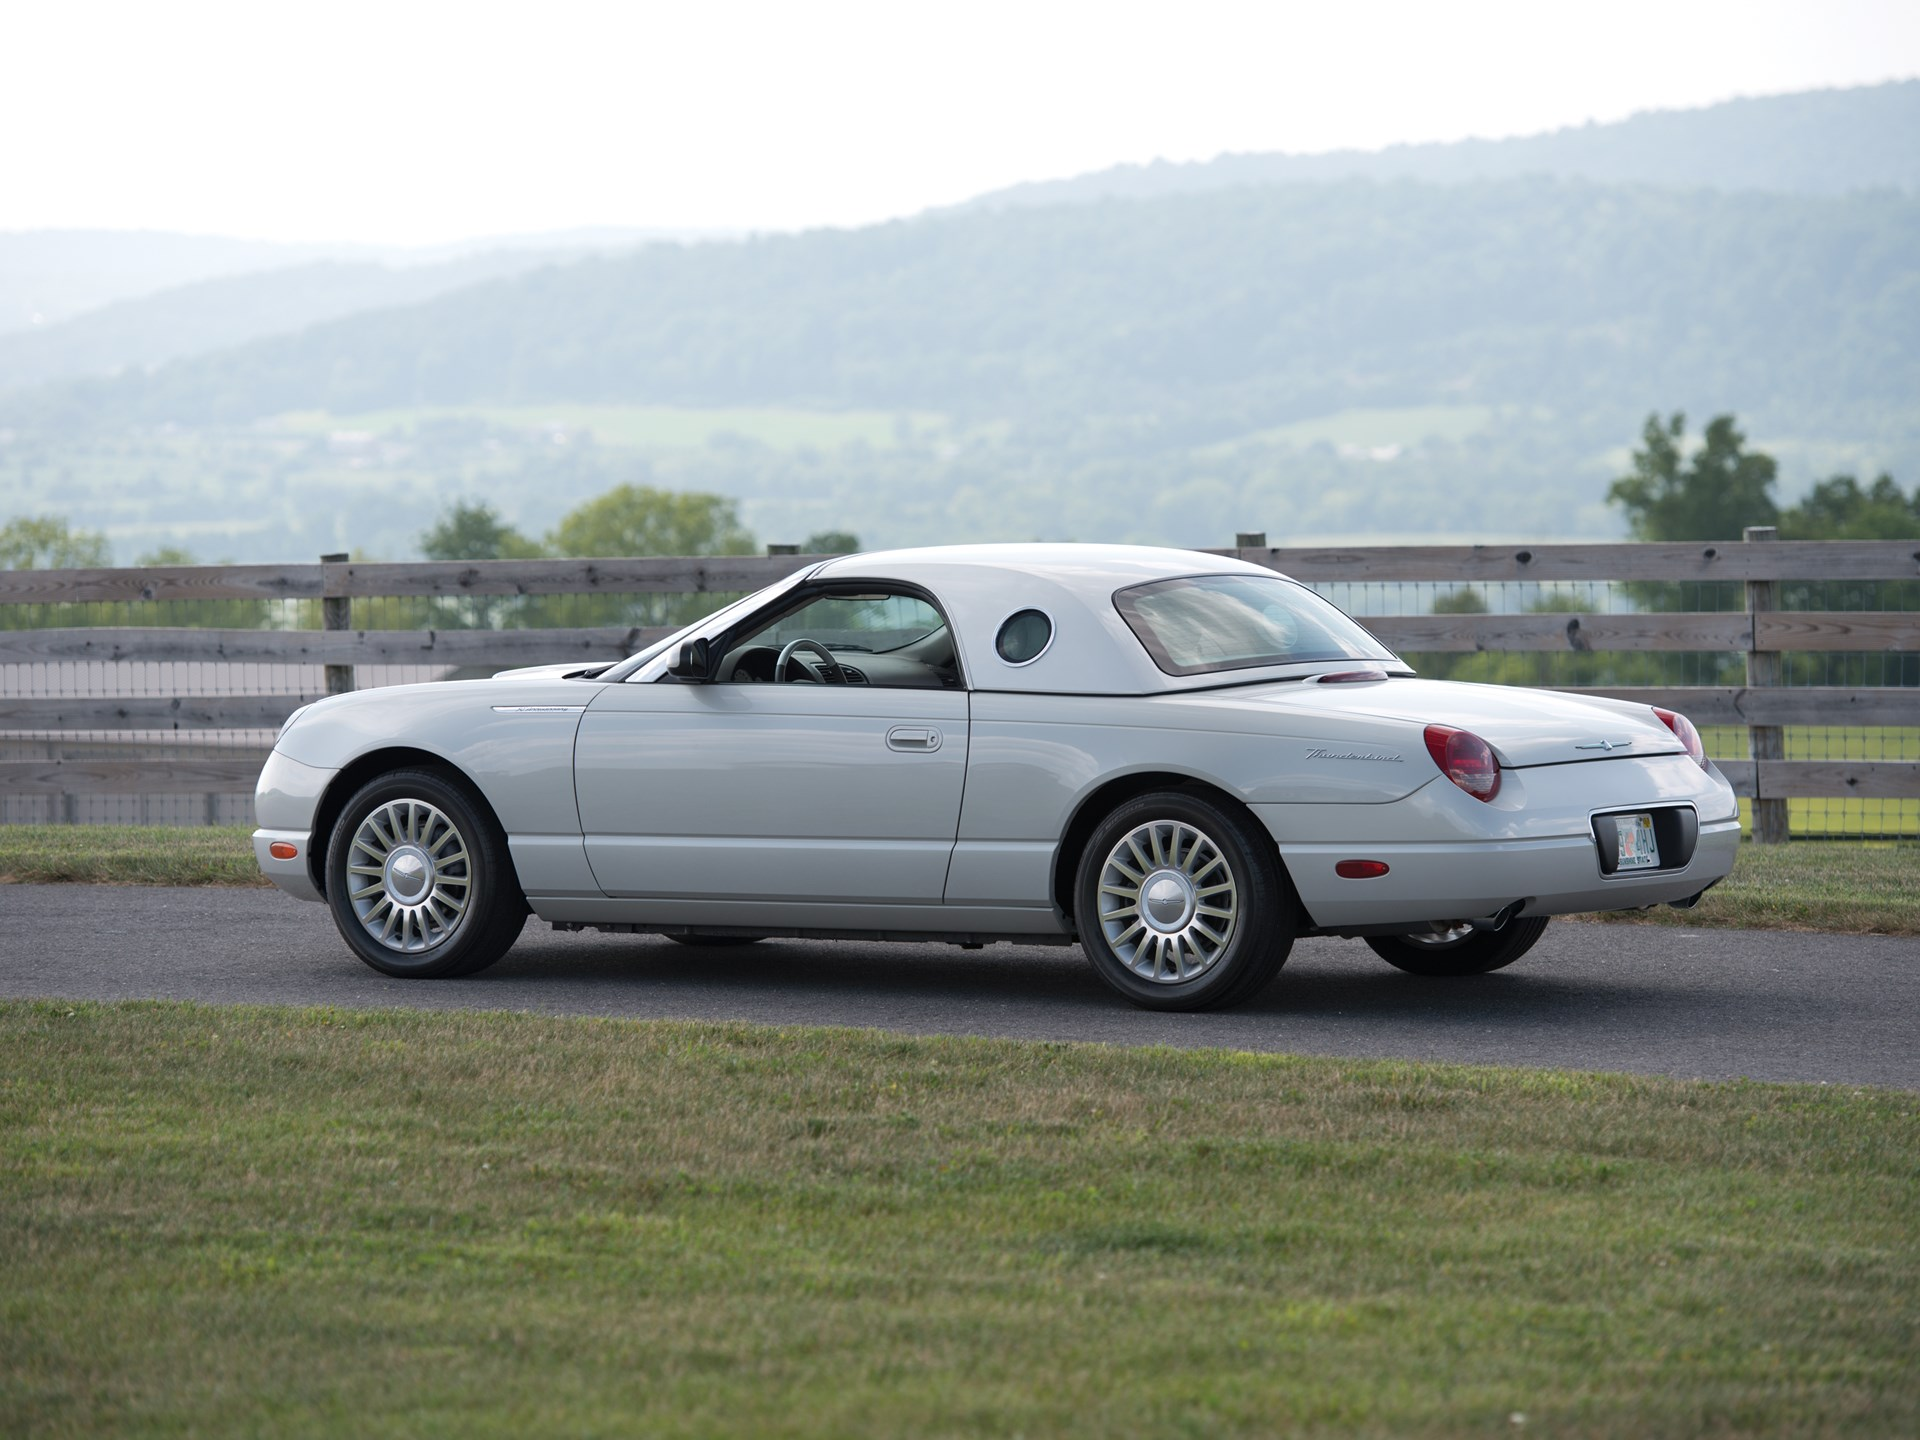 2005 Ford Thunderbird 50th Anniversary Edition